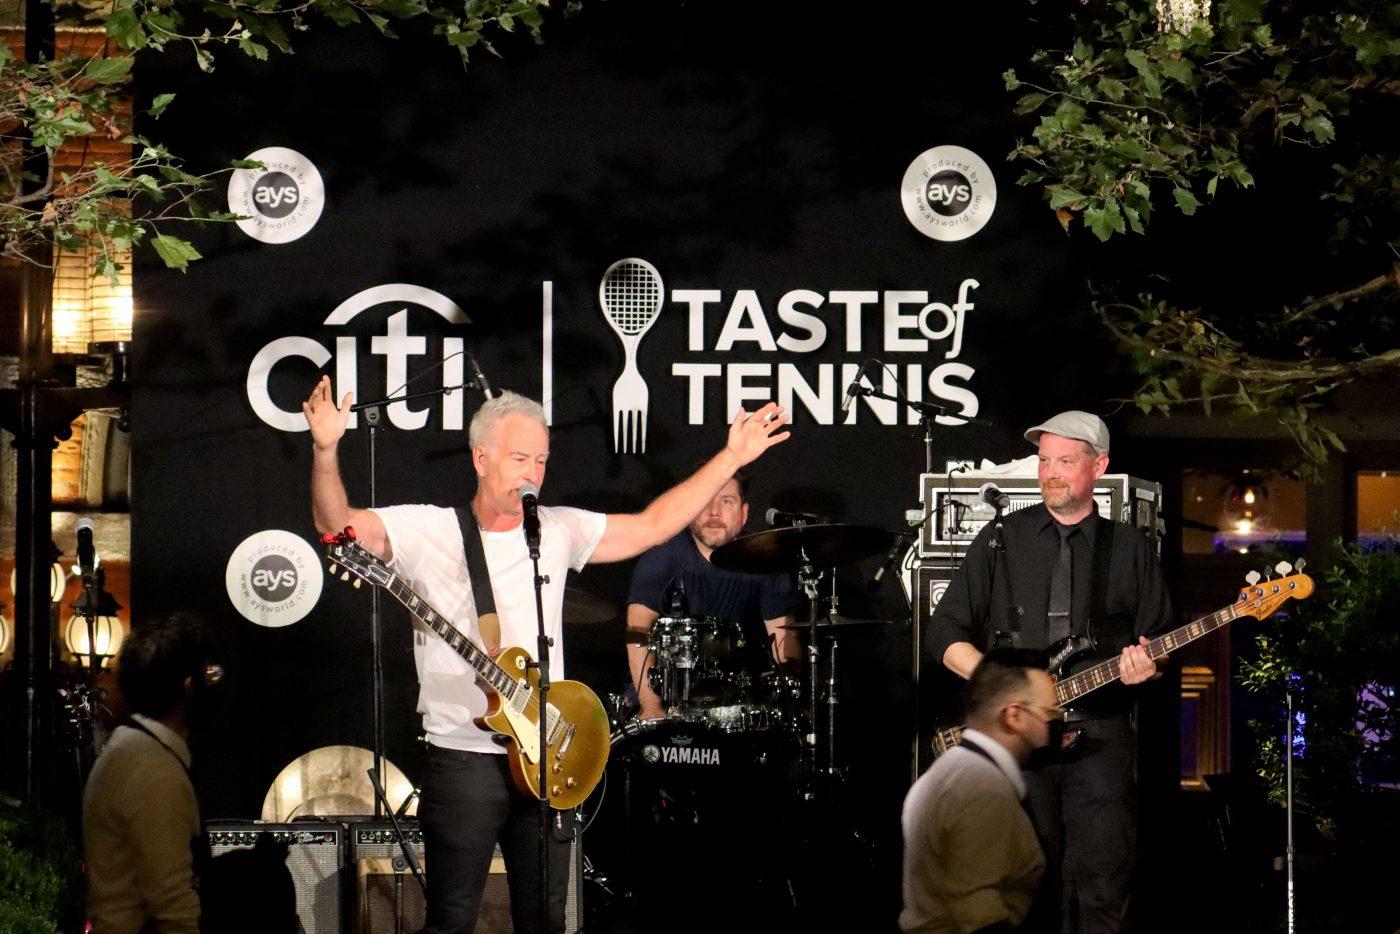 Taste of Tennis - John McEnroe Singing at Tavern on the Green